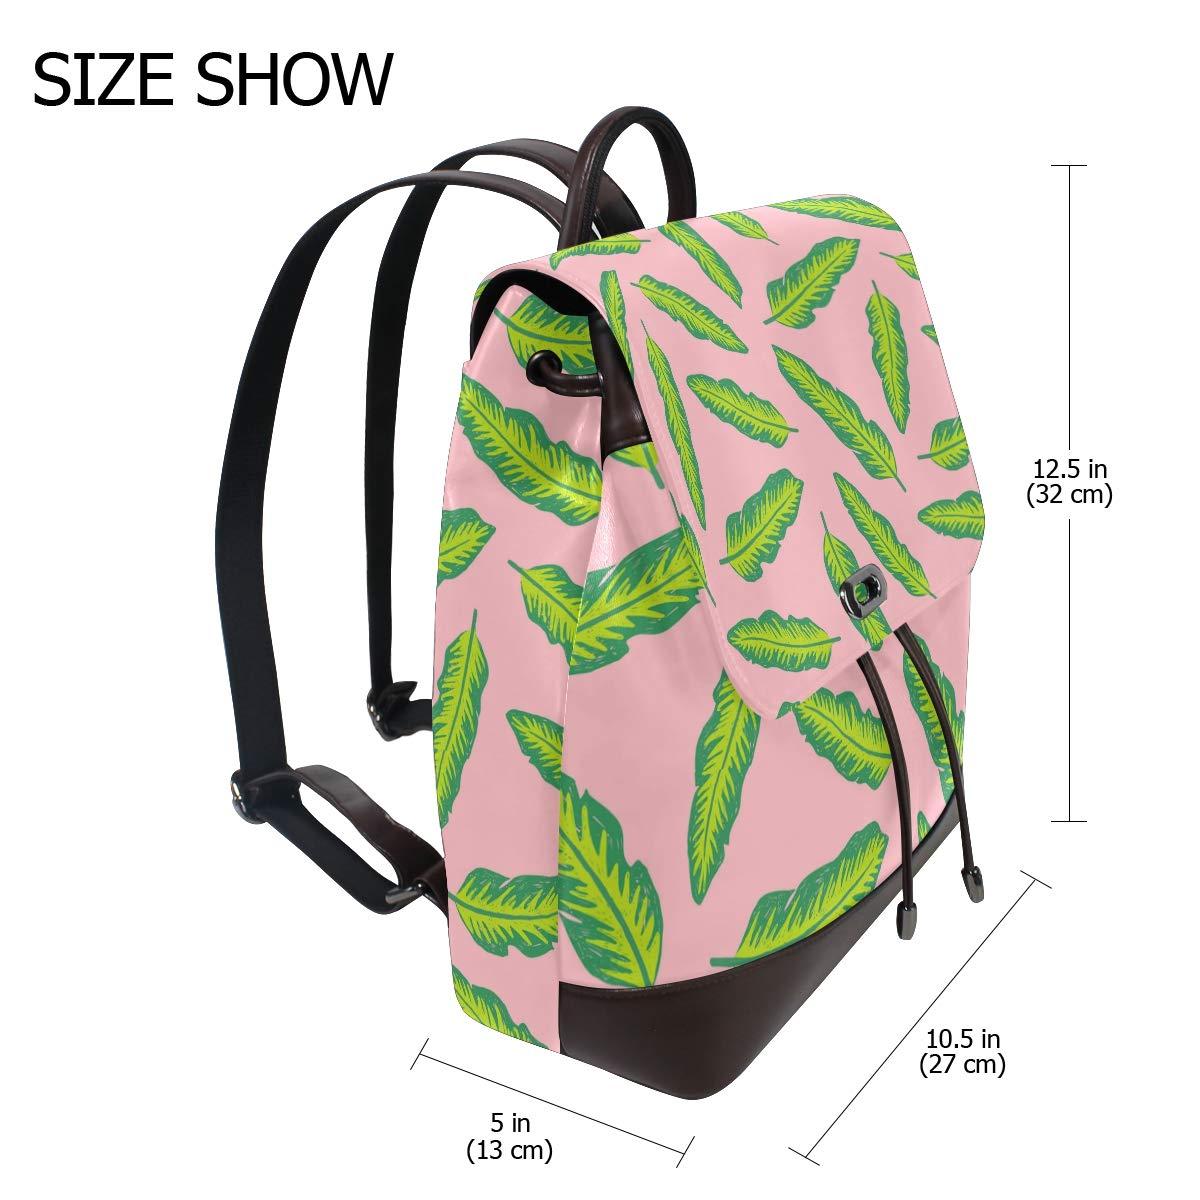 Fashion Shoulder Bag Rucksack PU Leather Women Girls Ladies Backpack Travel Bag Colourful Tropical Leaves Decals